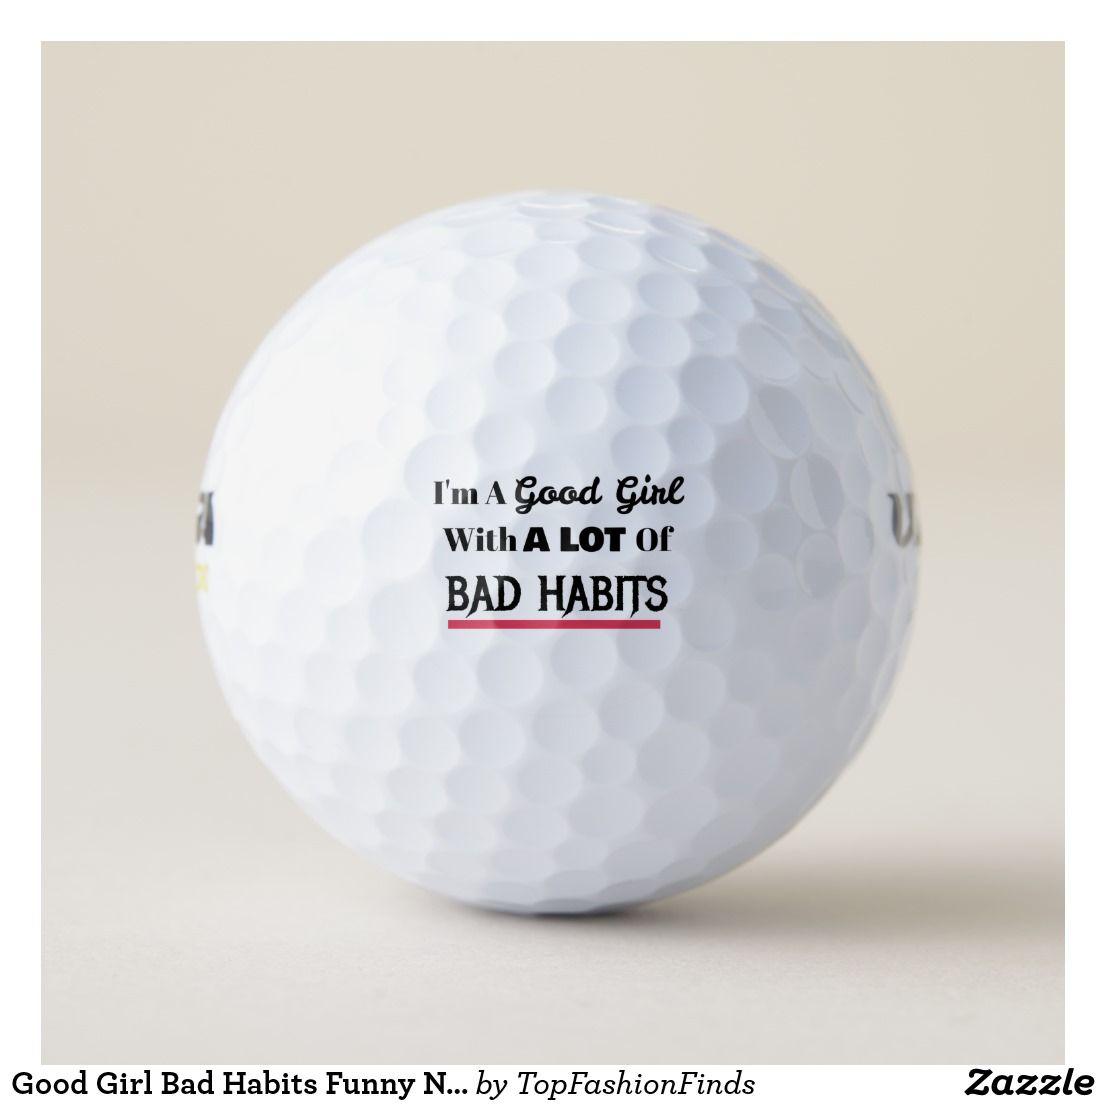 Good Girl Bad Habits Funny Naughty Golf Balls Zazzle Com Golf Ball Golf Humor Golf Quotes